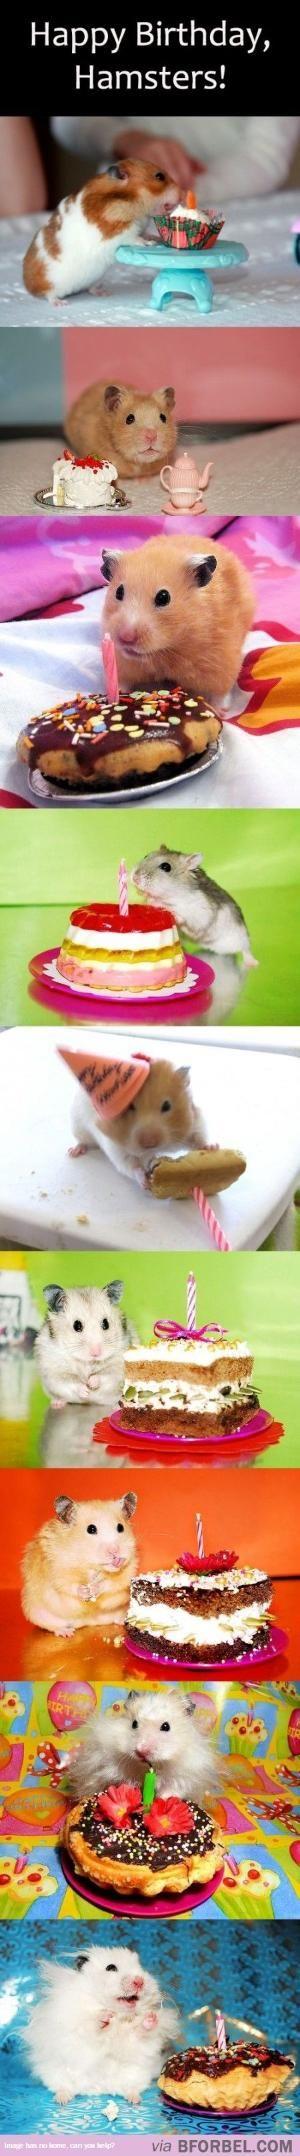 9 Hamsters Celebrating Their Birthdays… by tamara